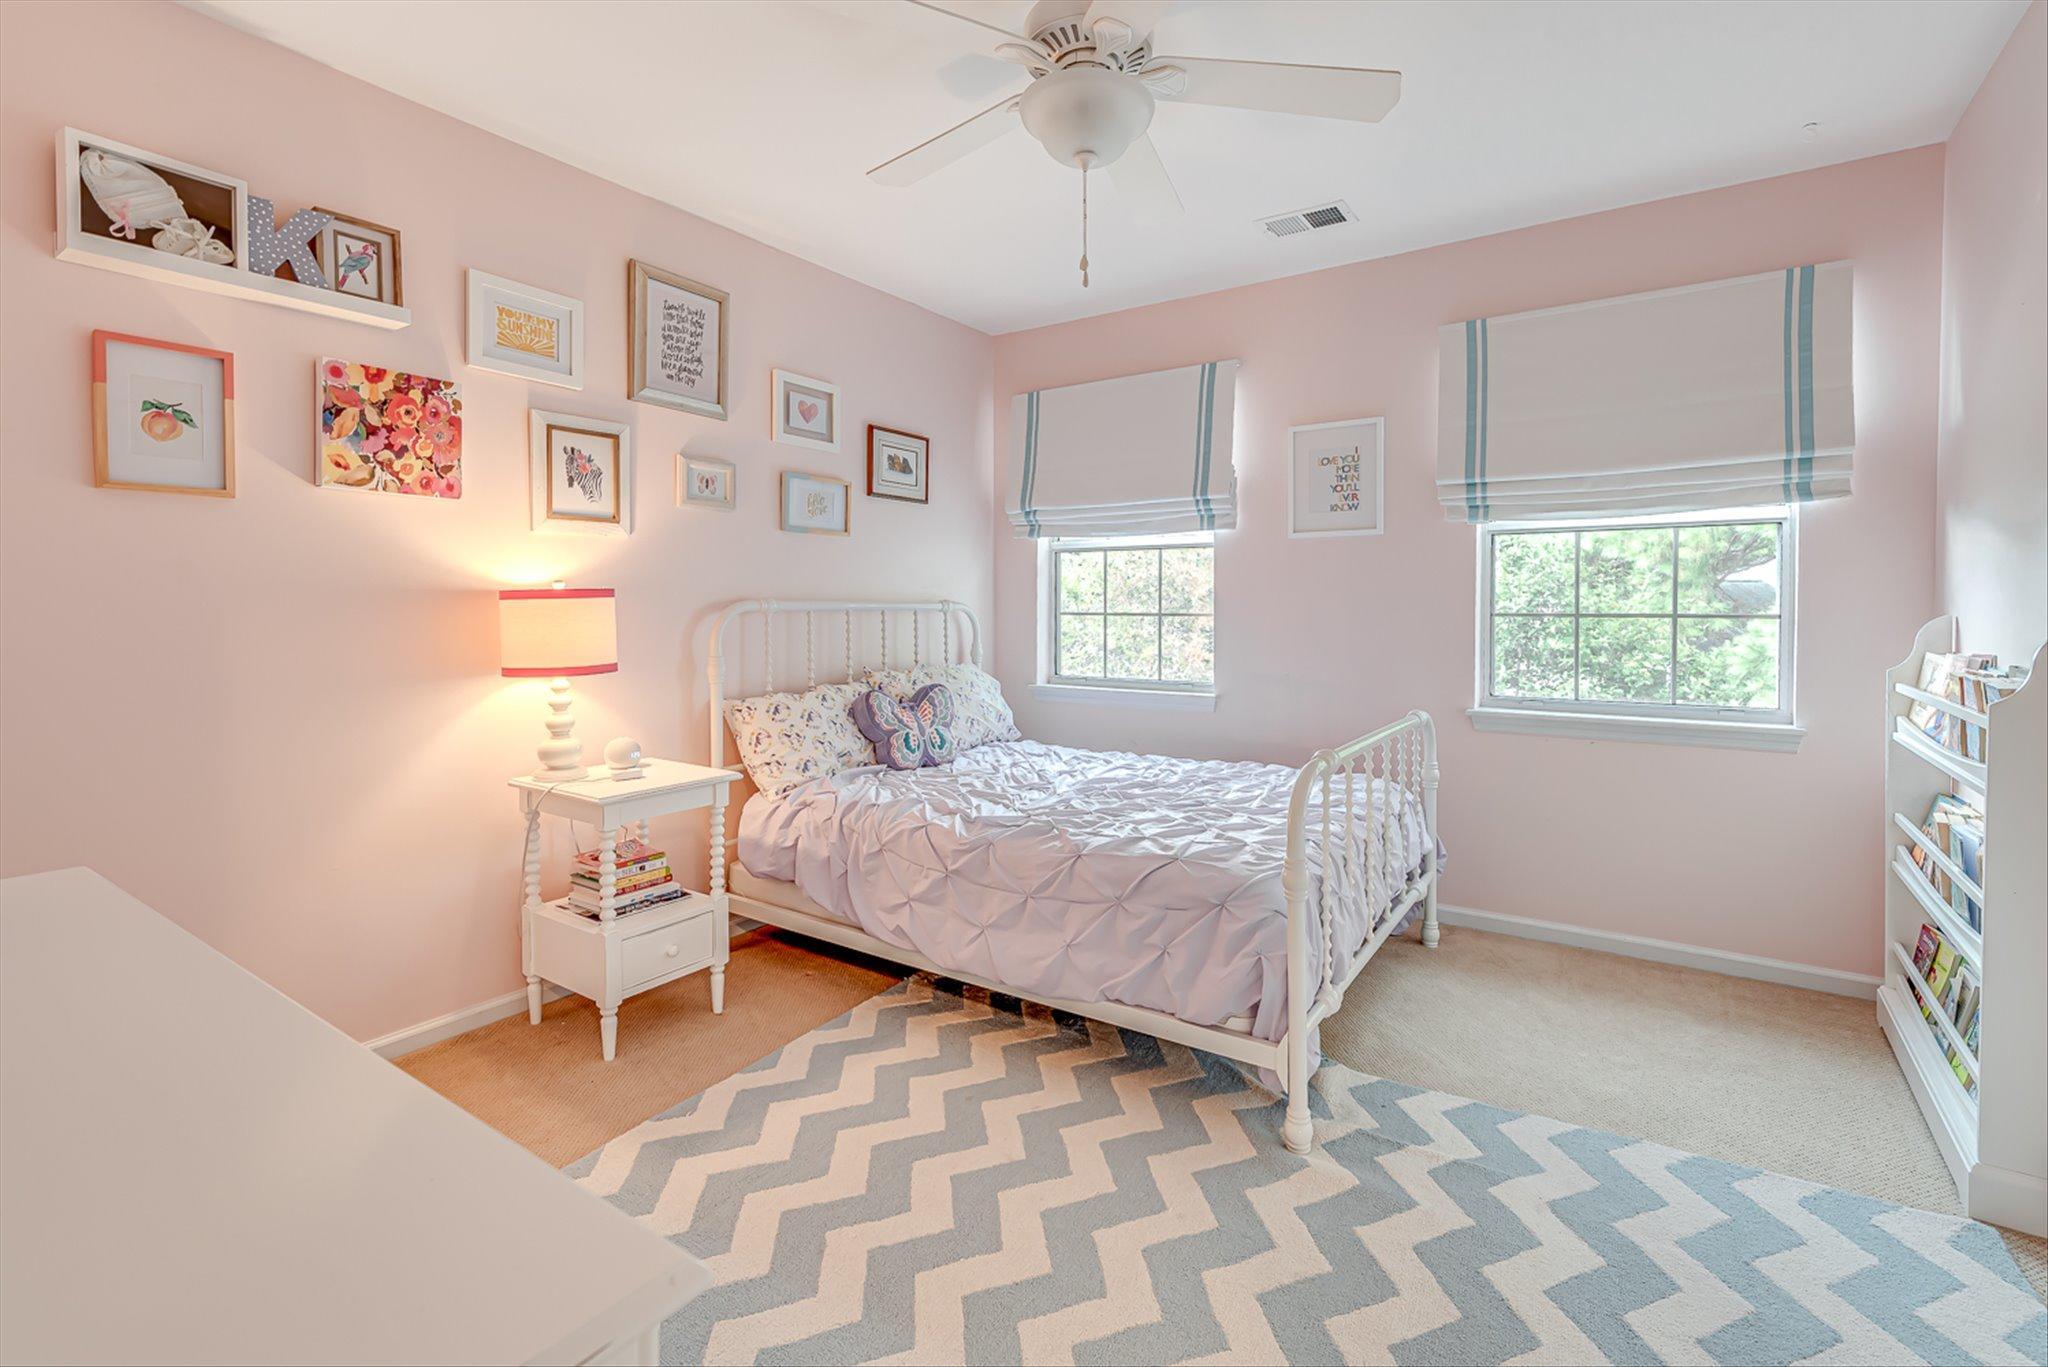 Belle Hall Homes For Sale - 278 Jardinere, Mount Pleasant, SC - 39